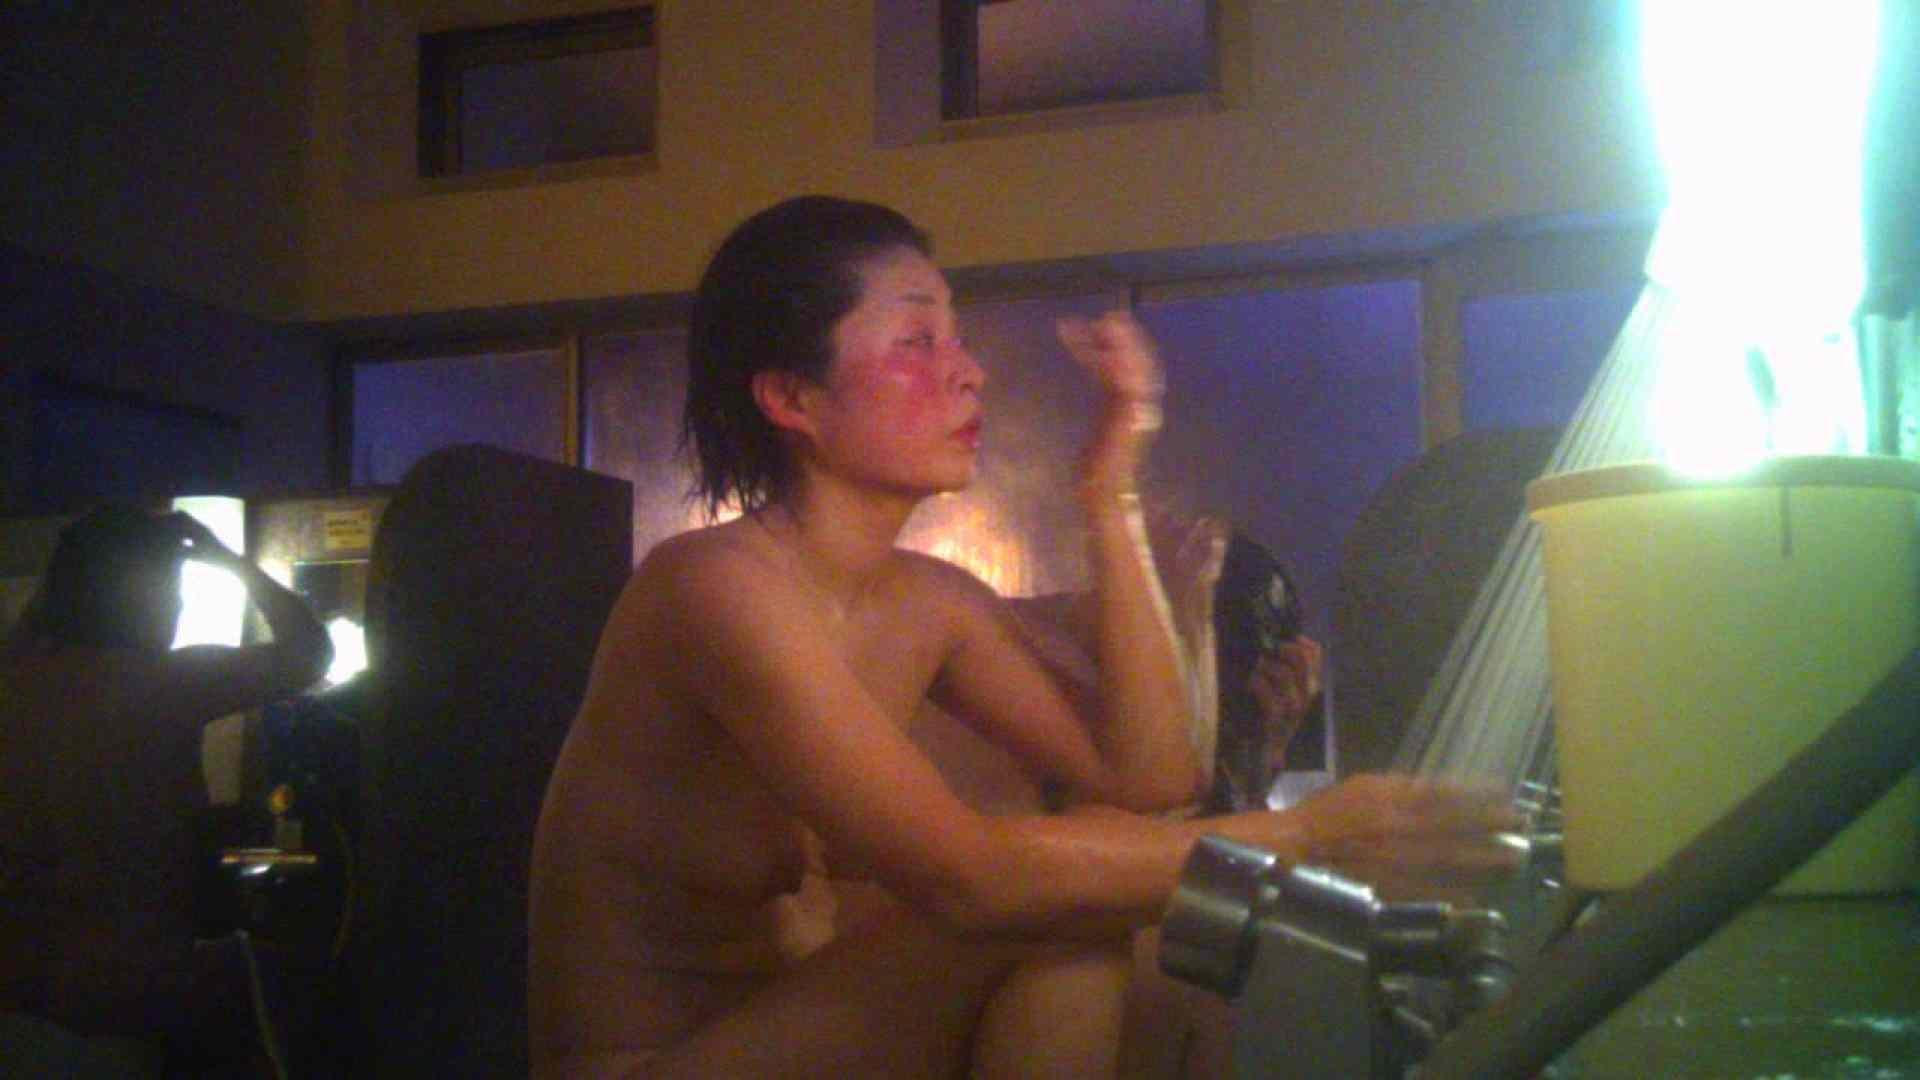 TG.21 【上等兵】井戸端会議が大好きな奥さん 垂れ乳 アダルト動画キャプチャ 81画像 64